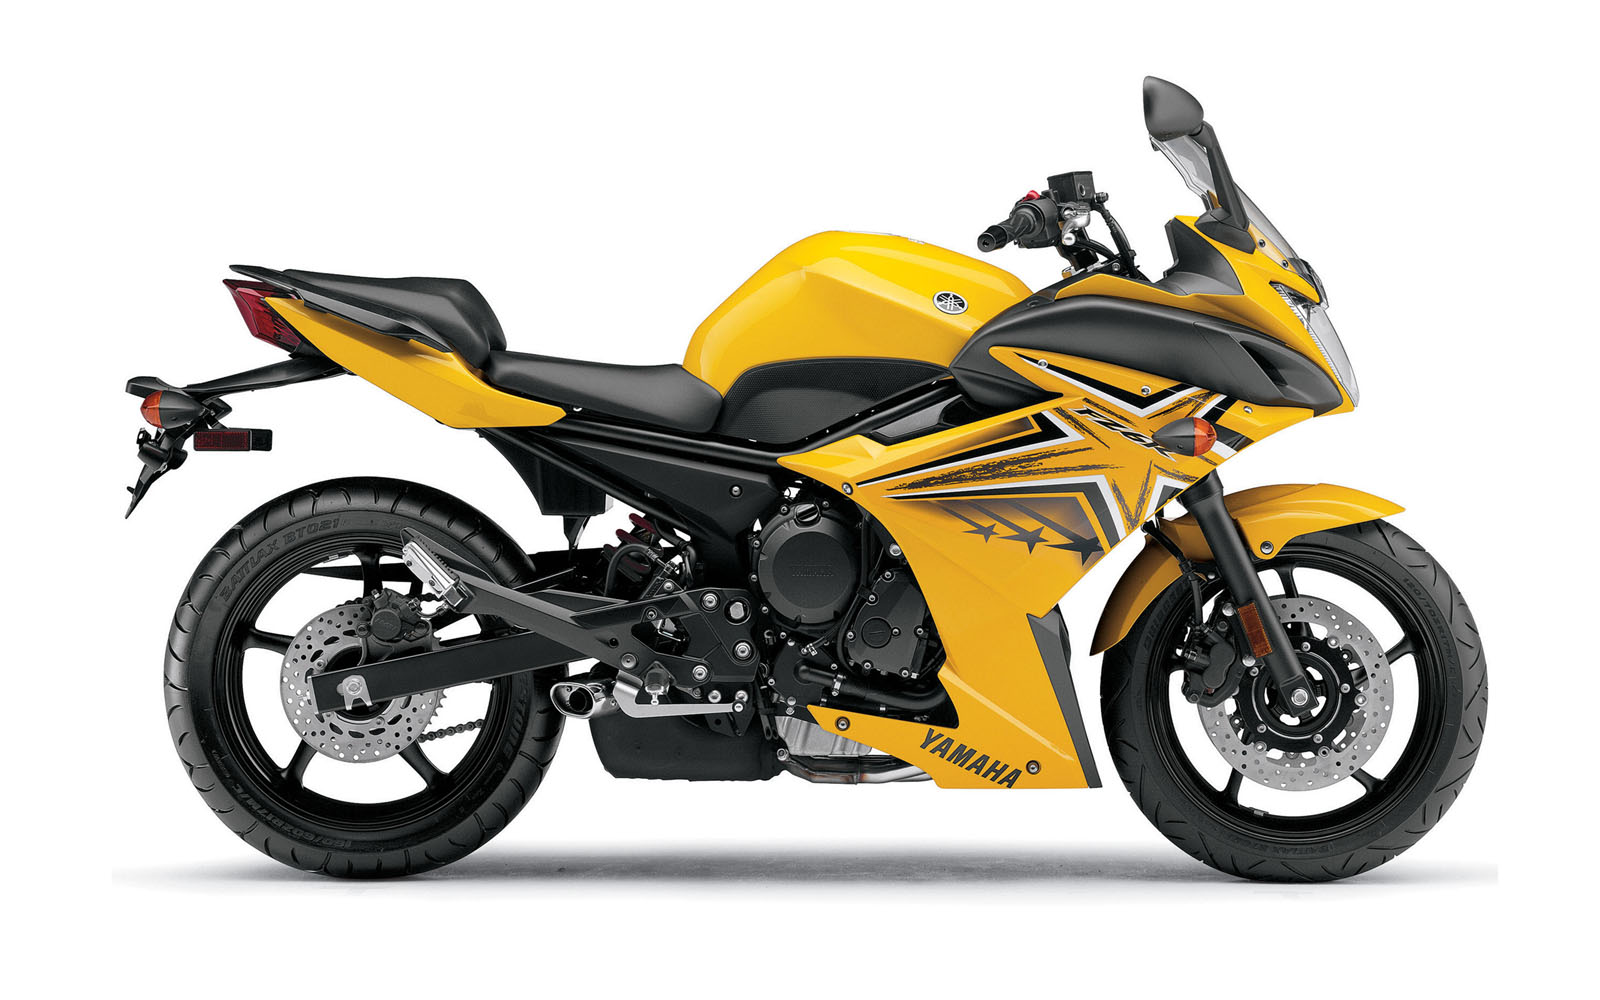 Keywords Yamaha FZ6R Motorcycle Wallpapers Yamaha FZ6R Motorcycle 1600x1000